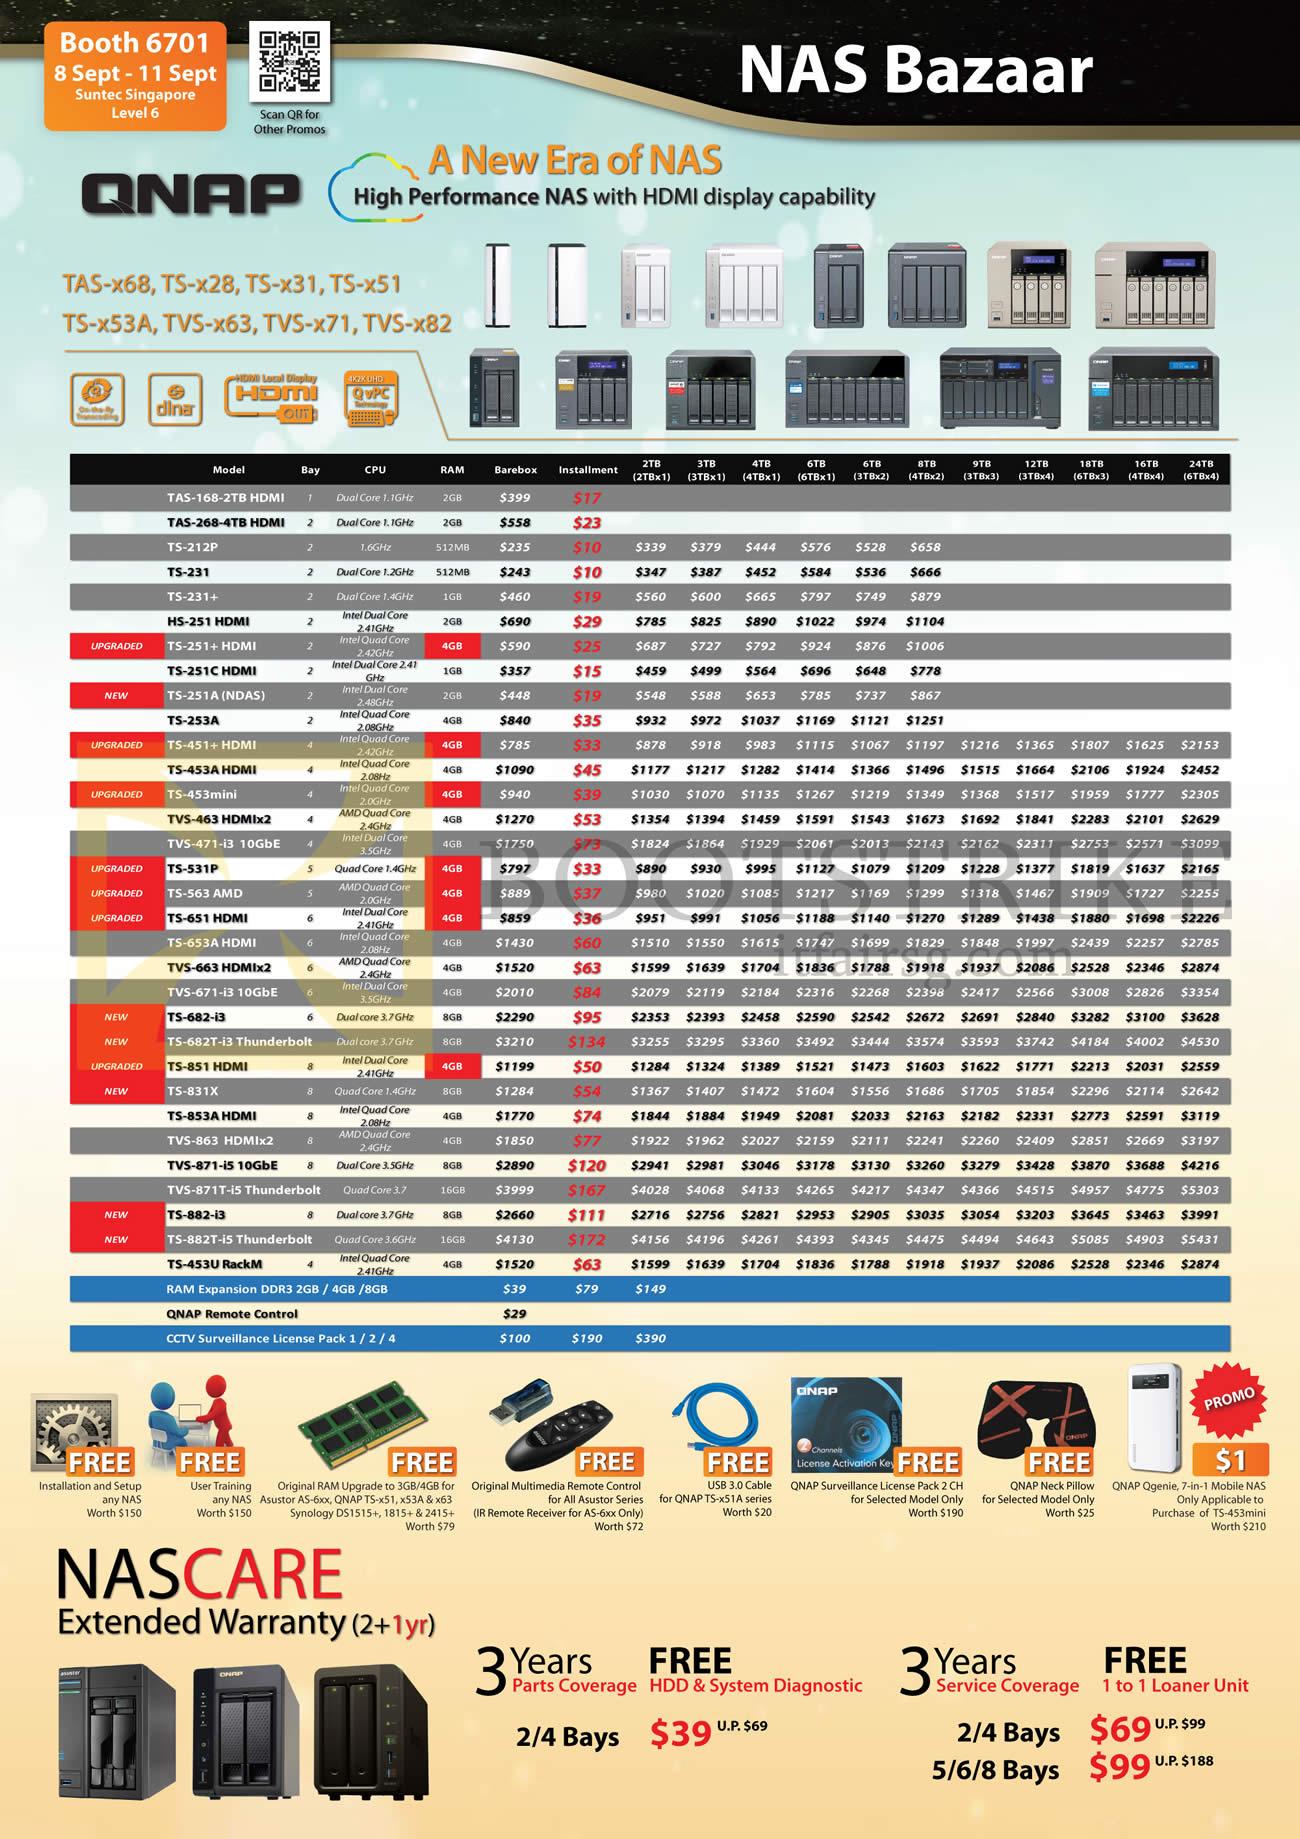 COMEX 2016 price list image brochure of Ace Peripherals QNAP NAS Bazaar TAS-168, 268, 212P, 231, 251, 251C, 251A, 253A, 453A, 453mini, 531P, 563, 651, 653A, TVS-463, 473, 663, 671